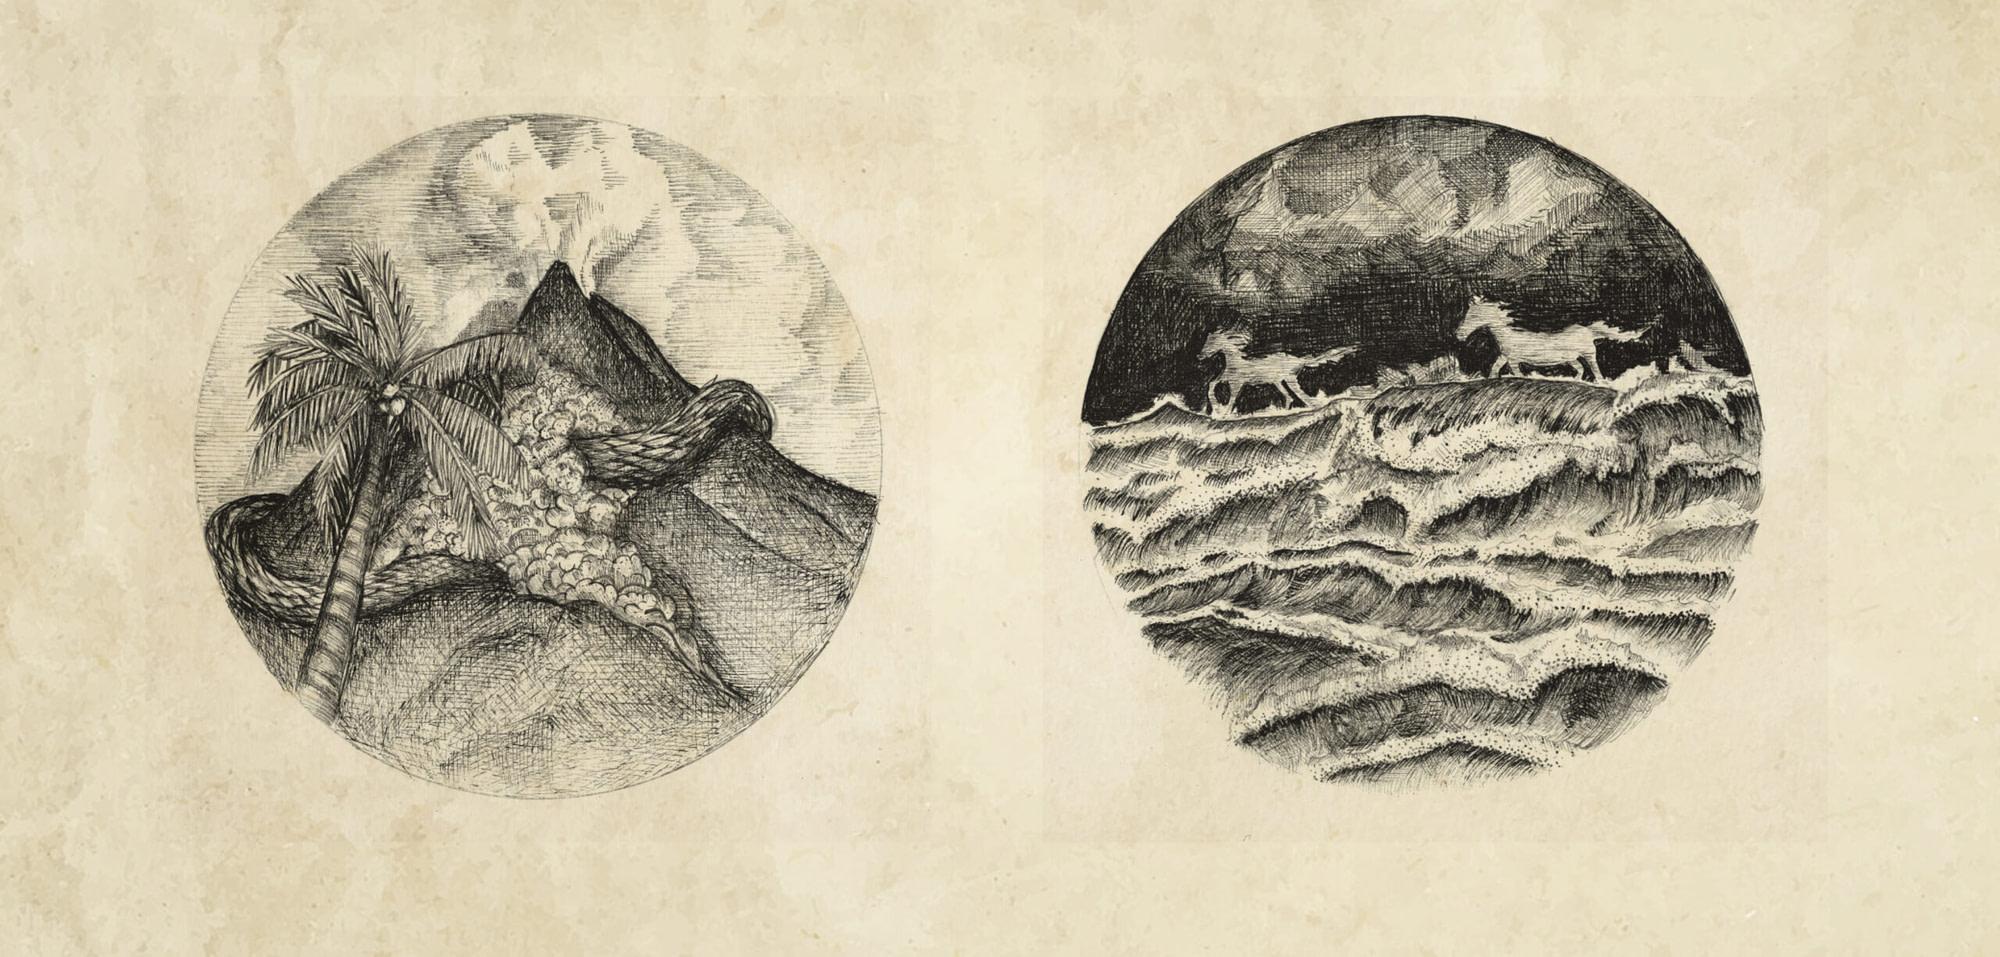 Fig. 5. Arcana imperii #2